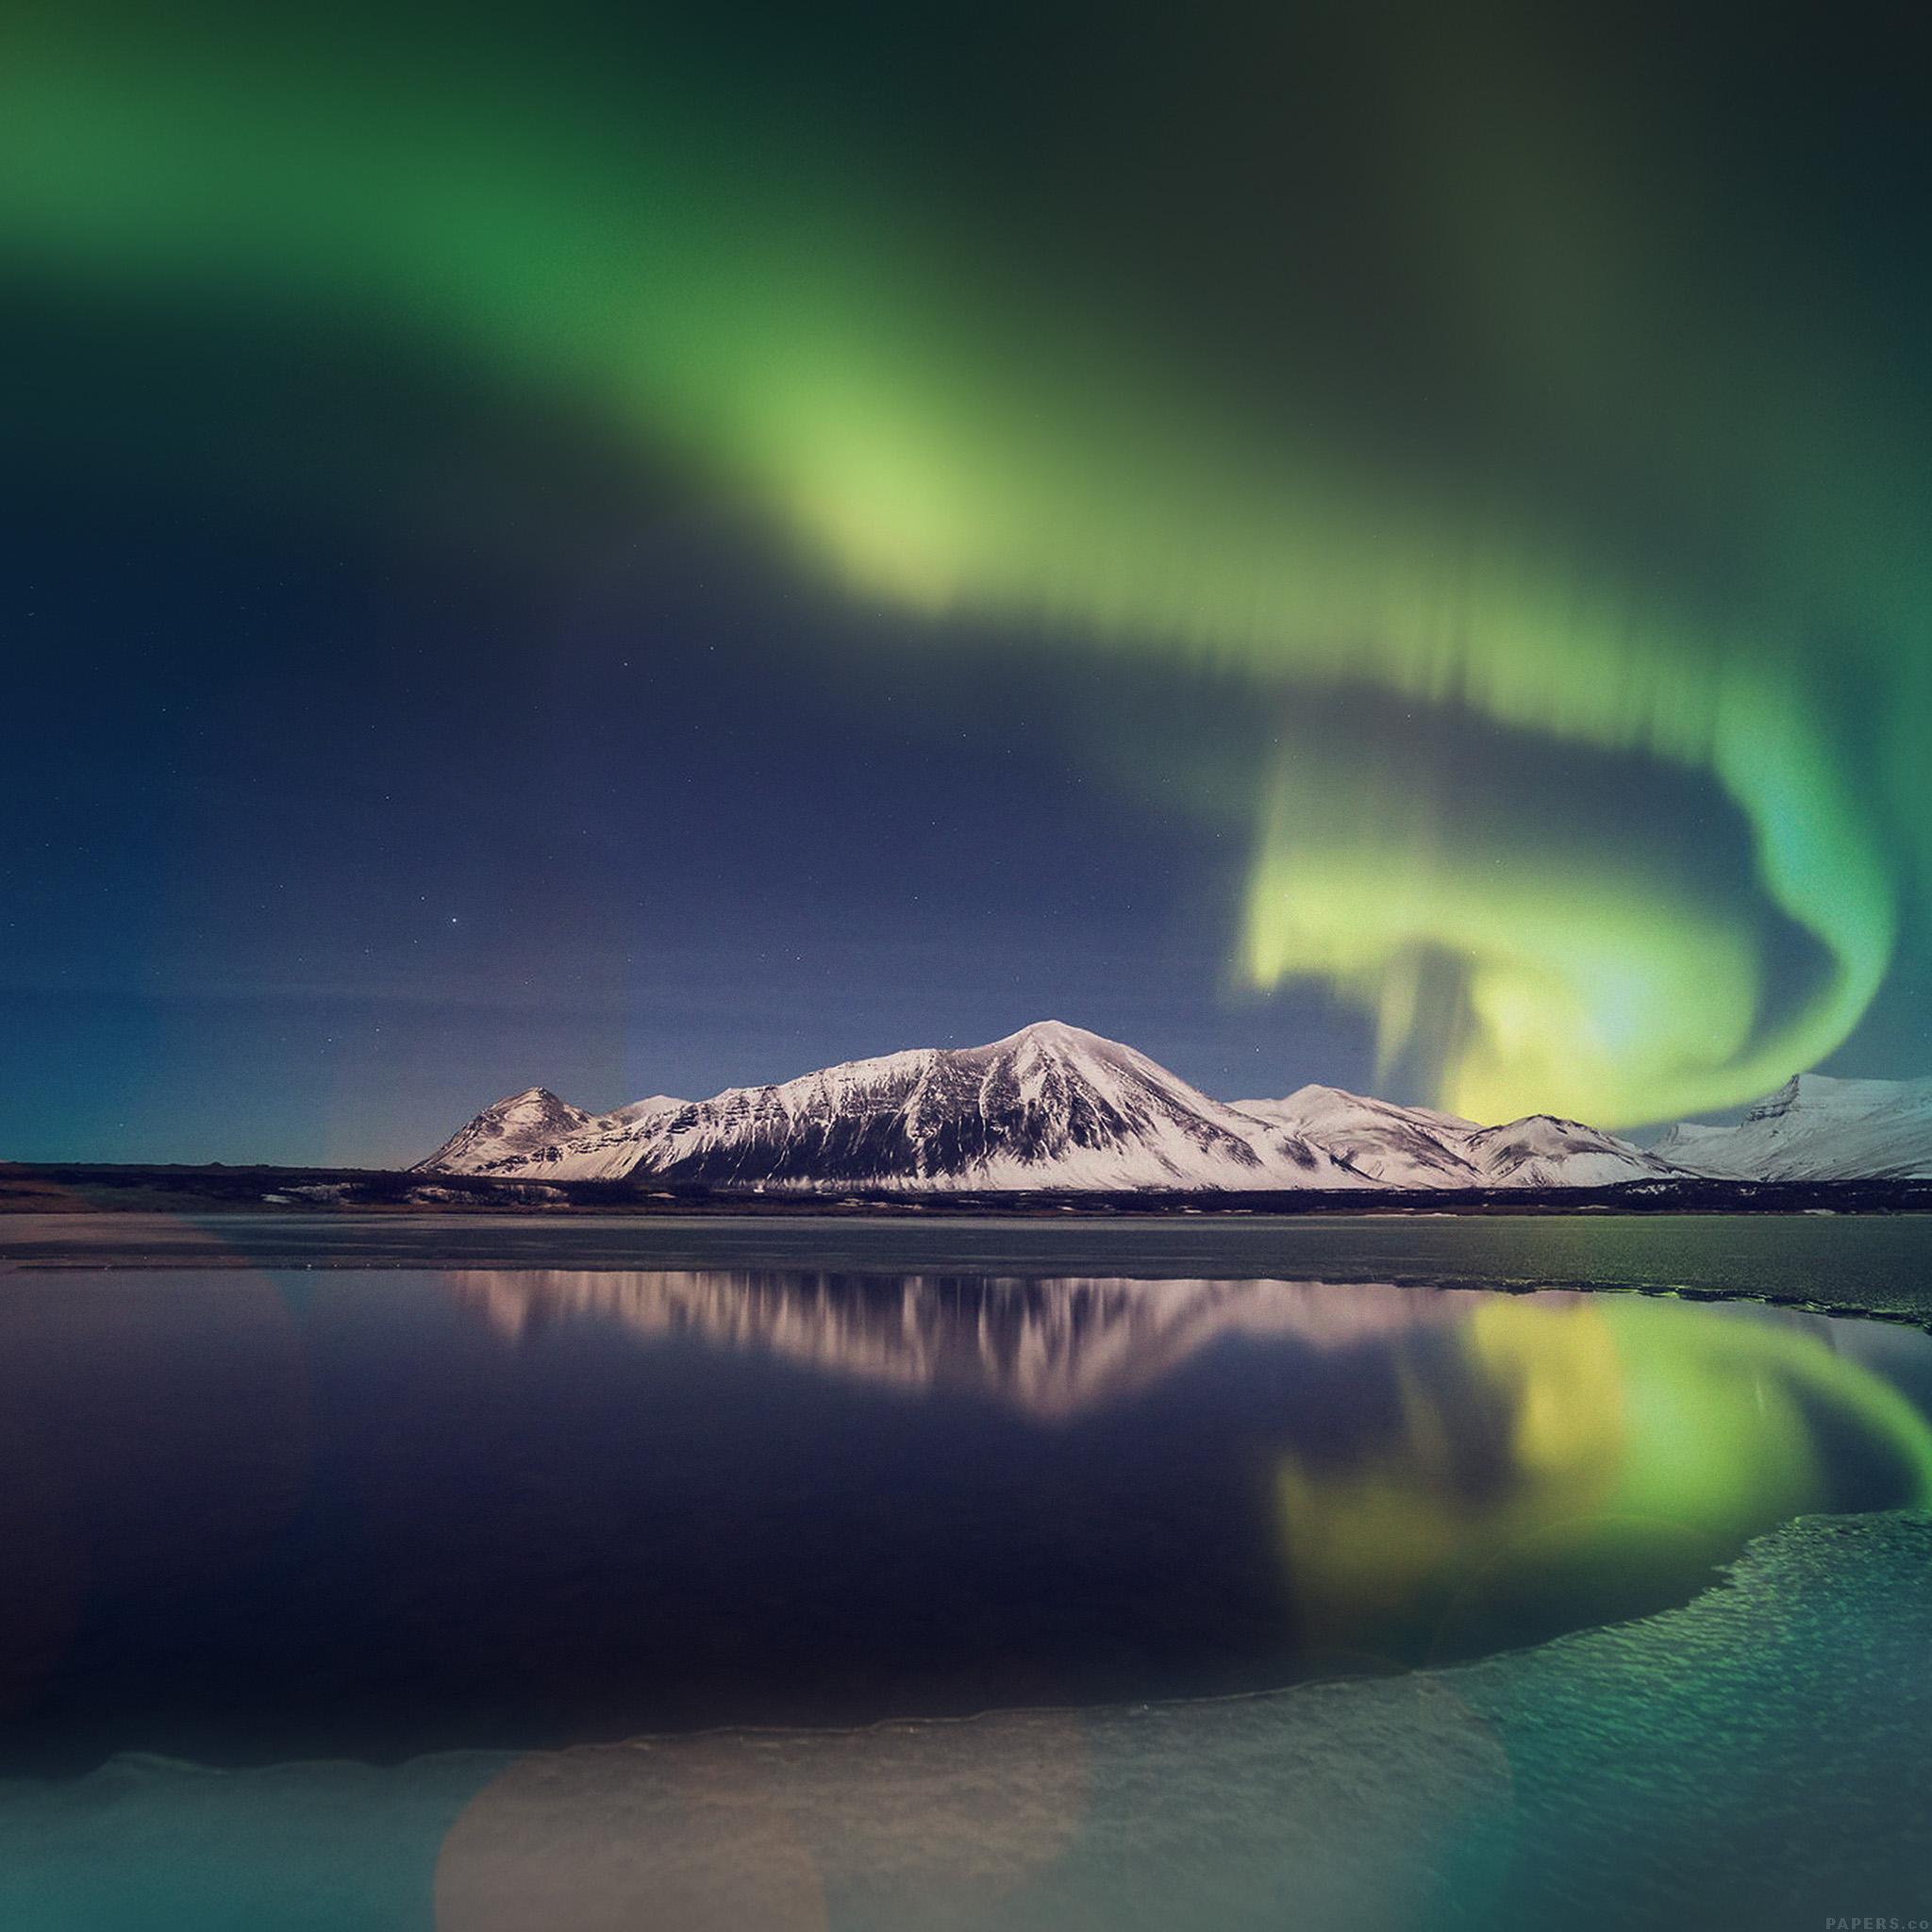 ml93-aurora-night-sky-instagram-art ...